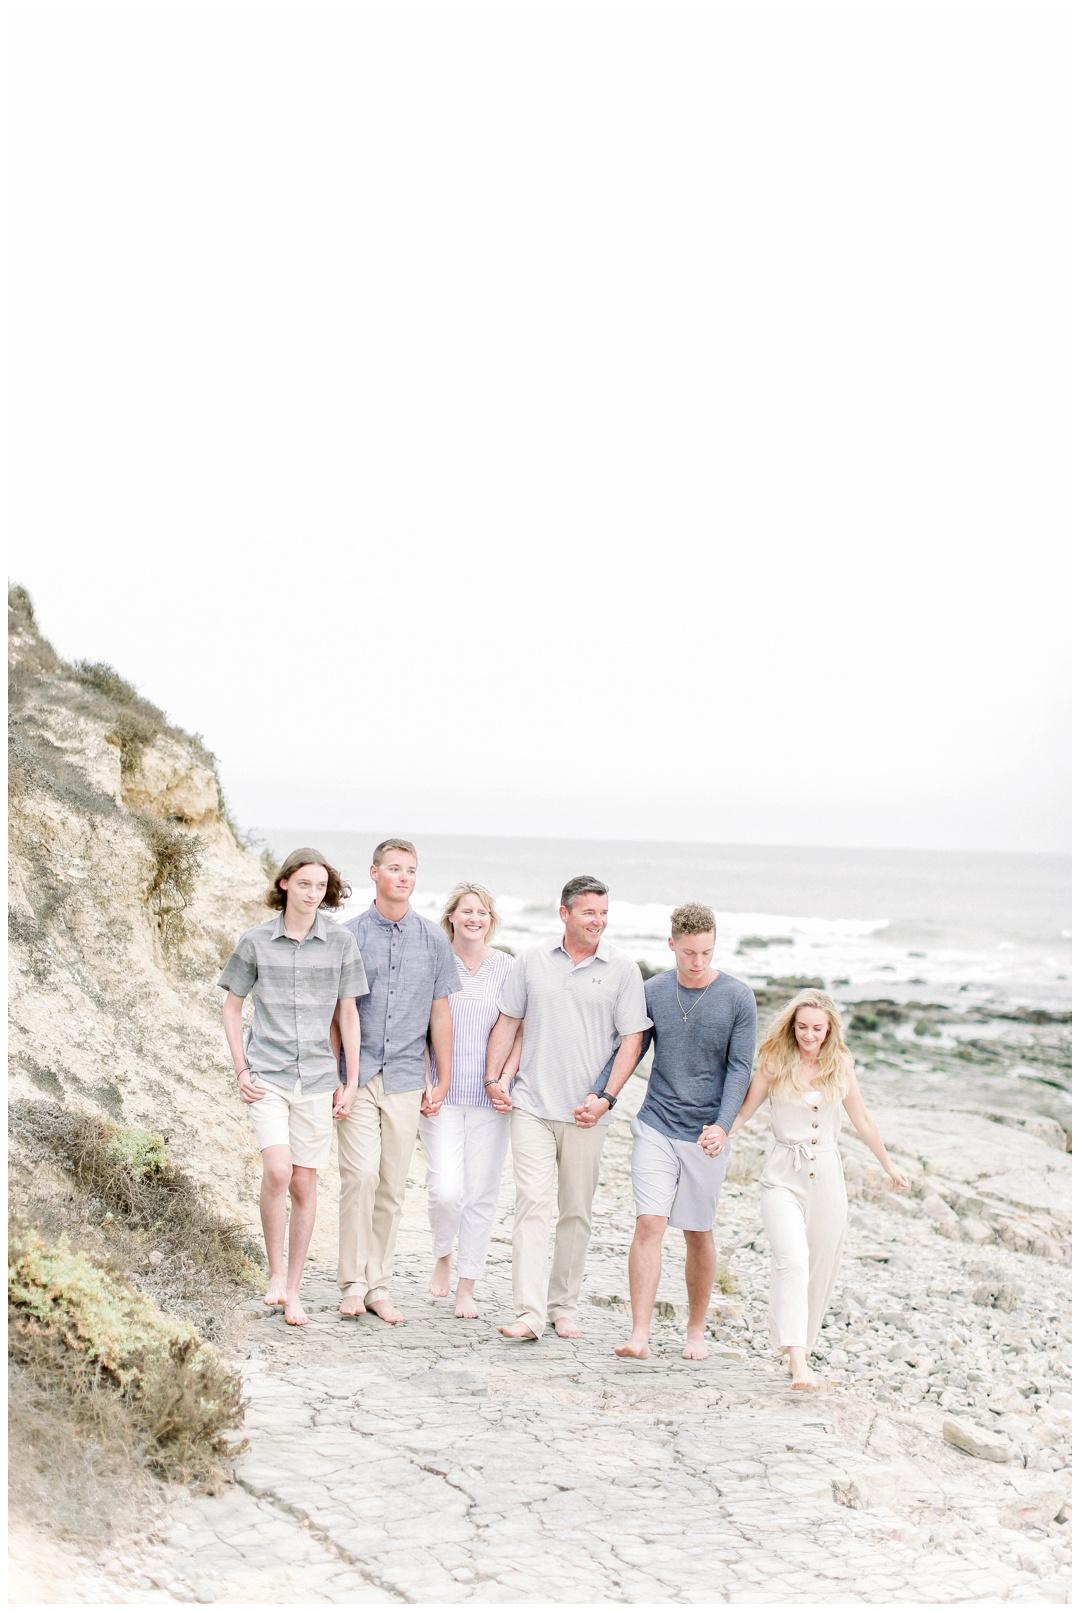 Newport_Beach_Family_Photographer_Orange_County_Family_Photography_Cori_Kleckner_Photography_Orange_County_Family_Photographer_Beach_Family_Session__1225.jpg